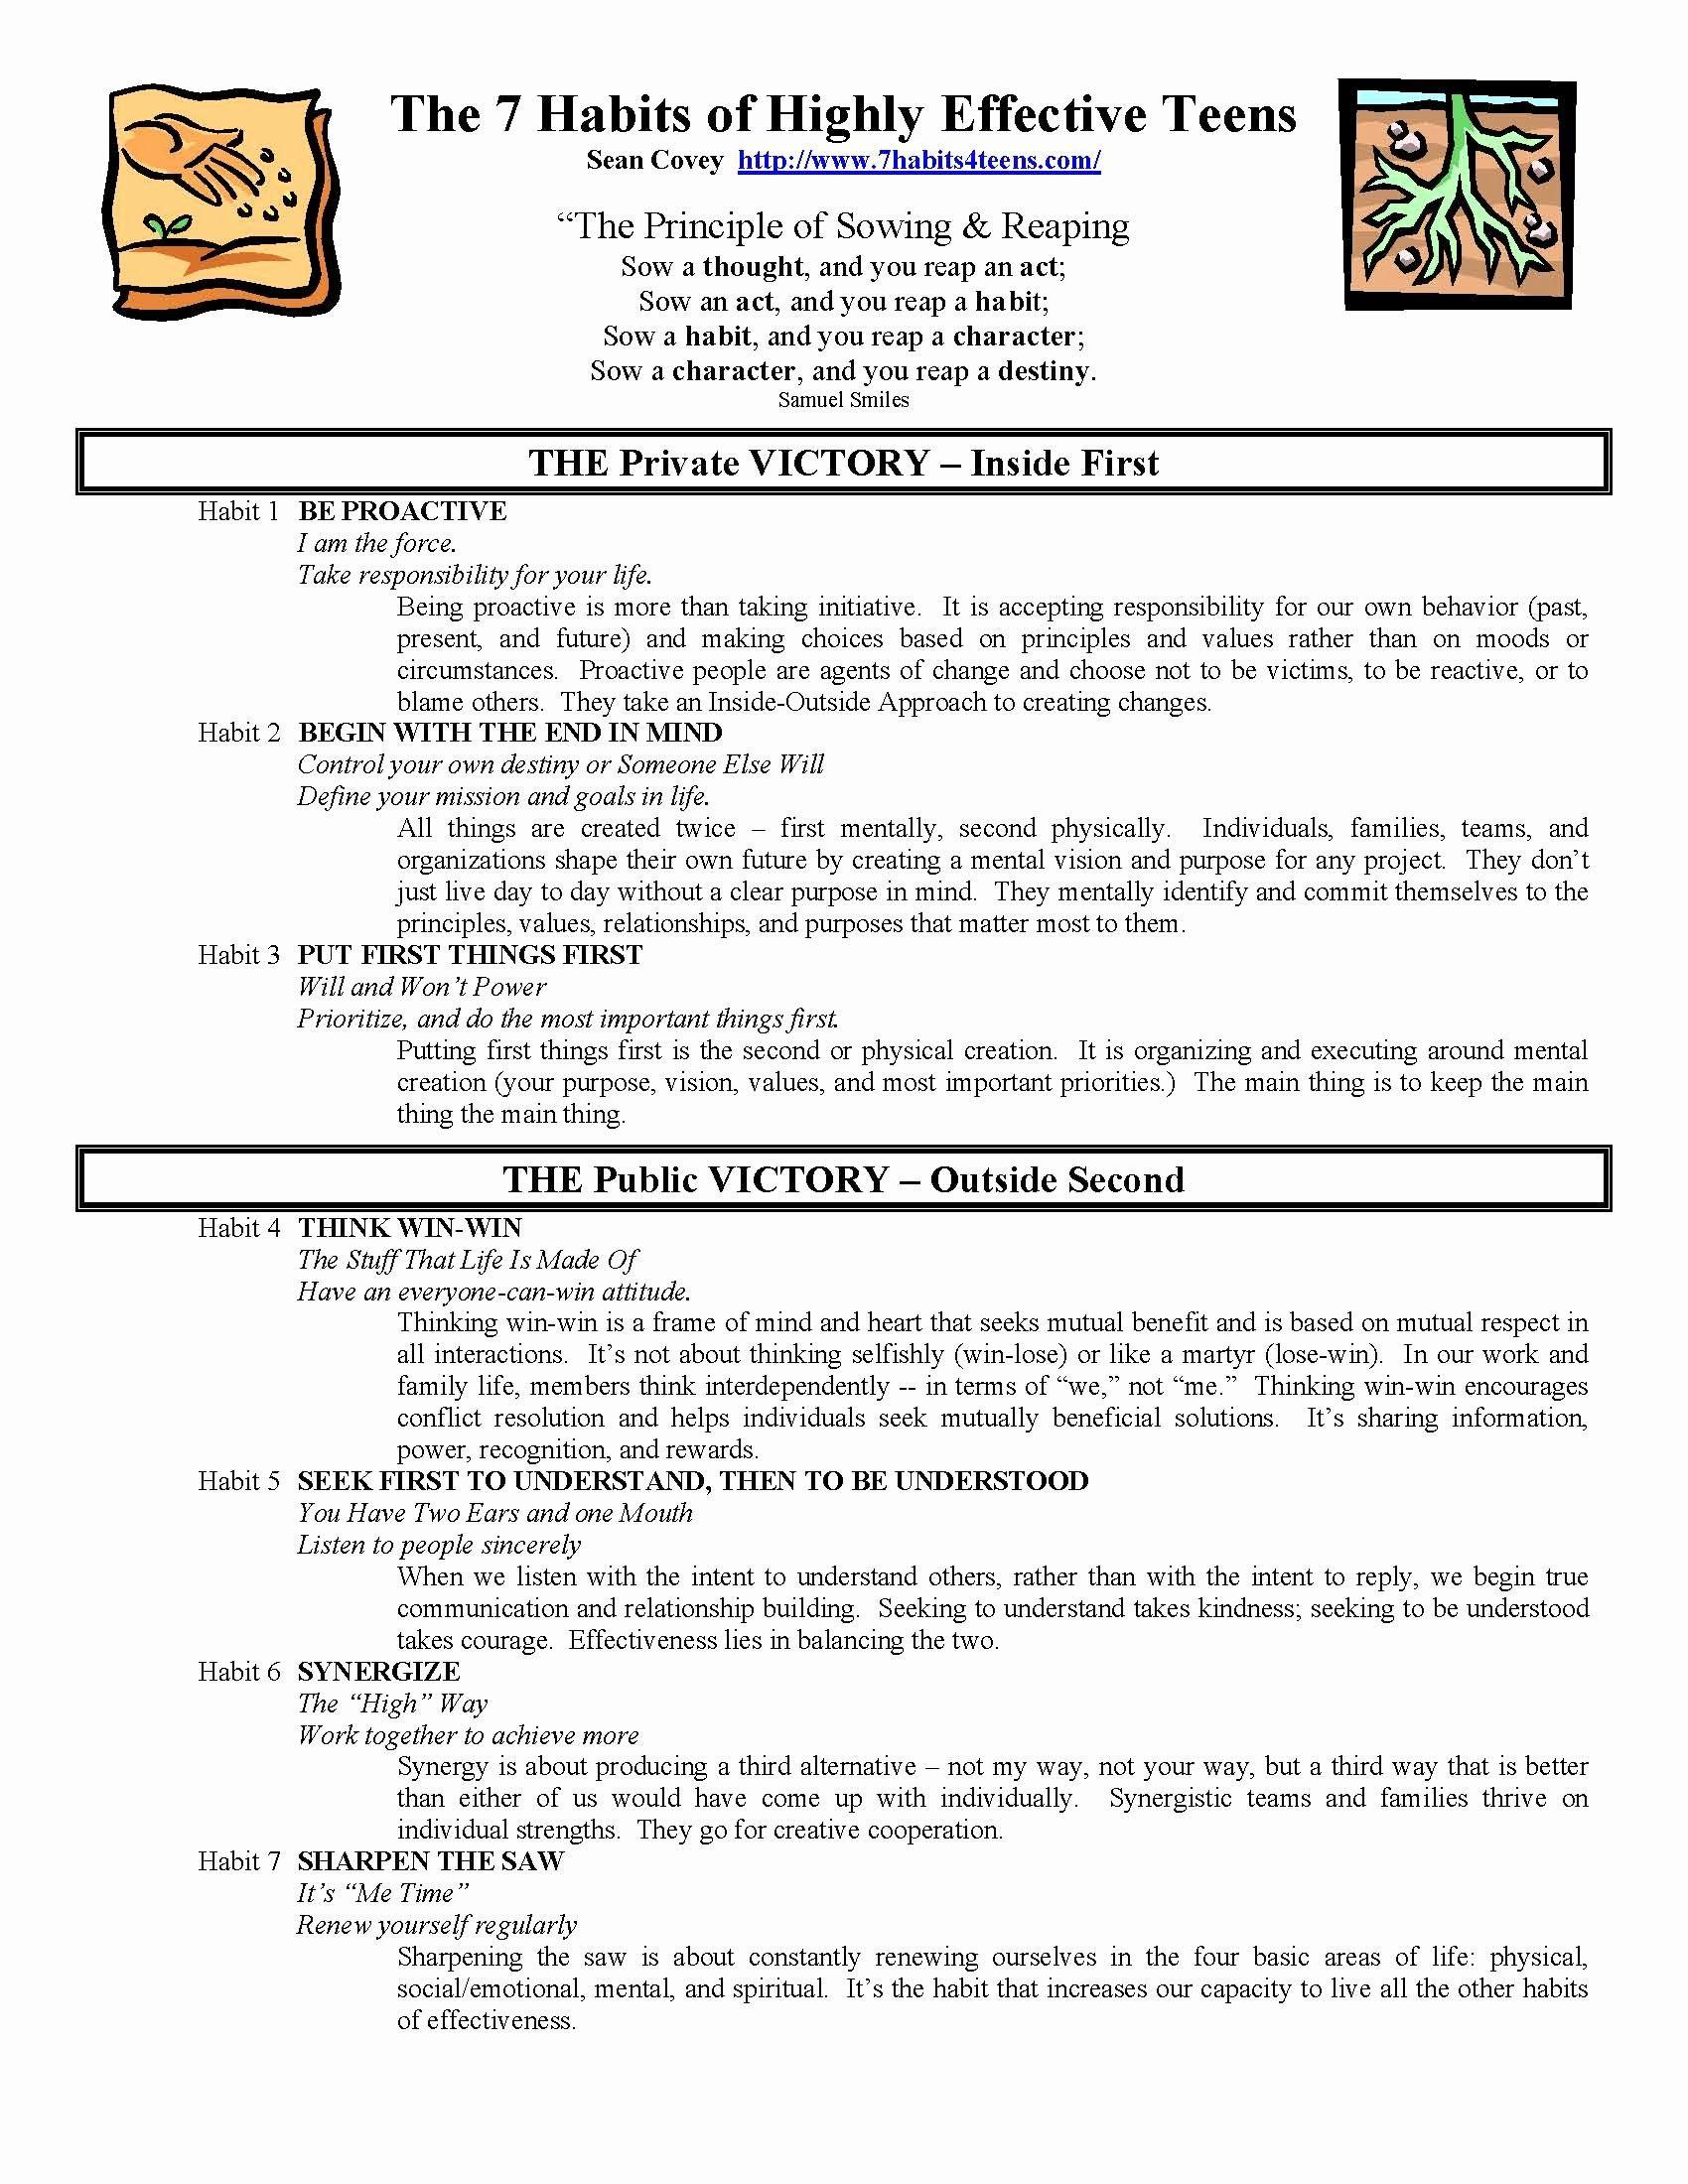 7 Habits Worksheet Pdf Luxury 7 Habits Highly Effective Teens Worksheets  the Best   School organization for teens [ 2200 x 1700 Pixel ]